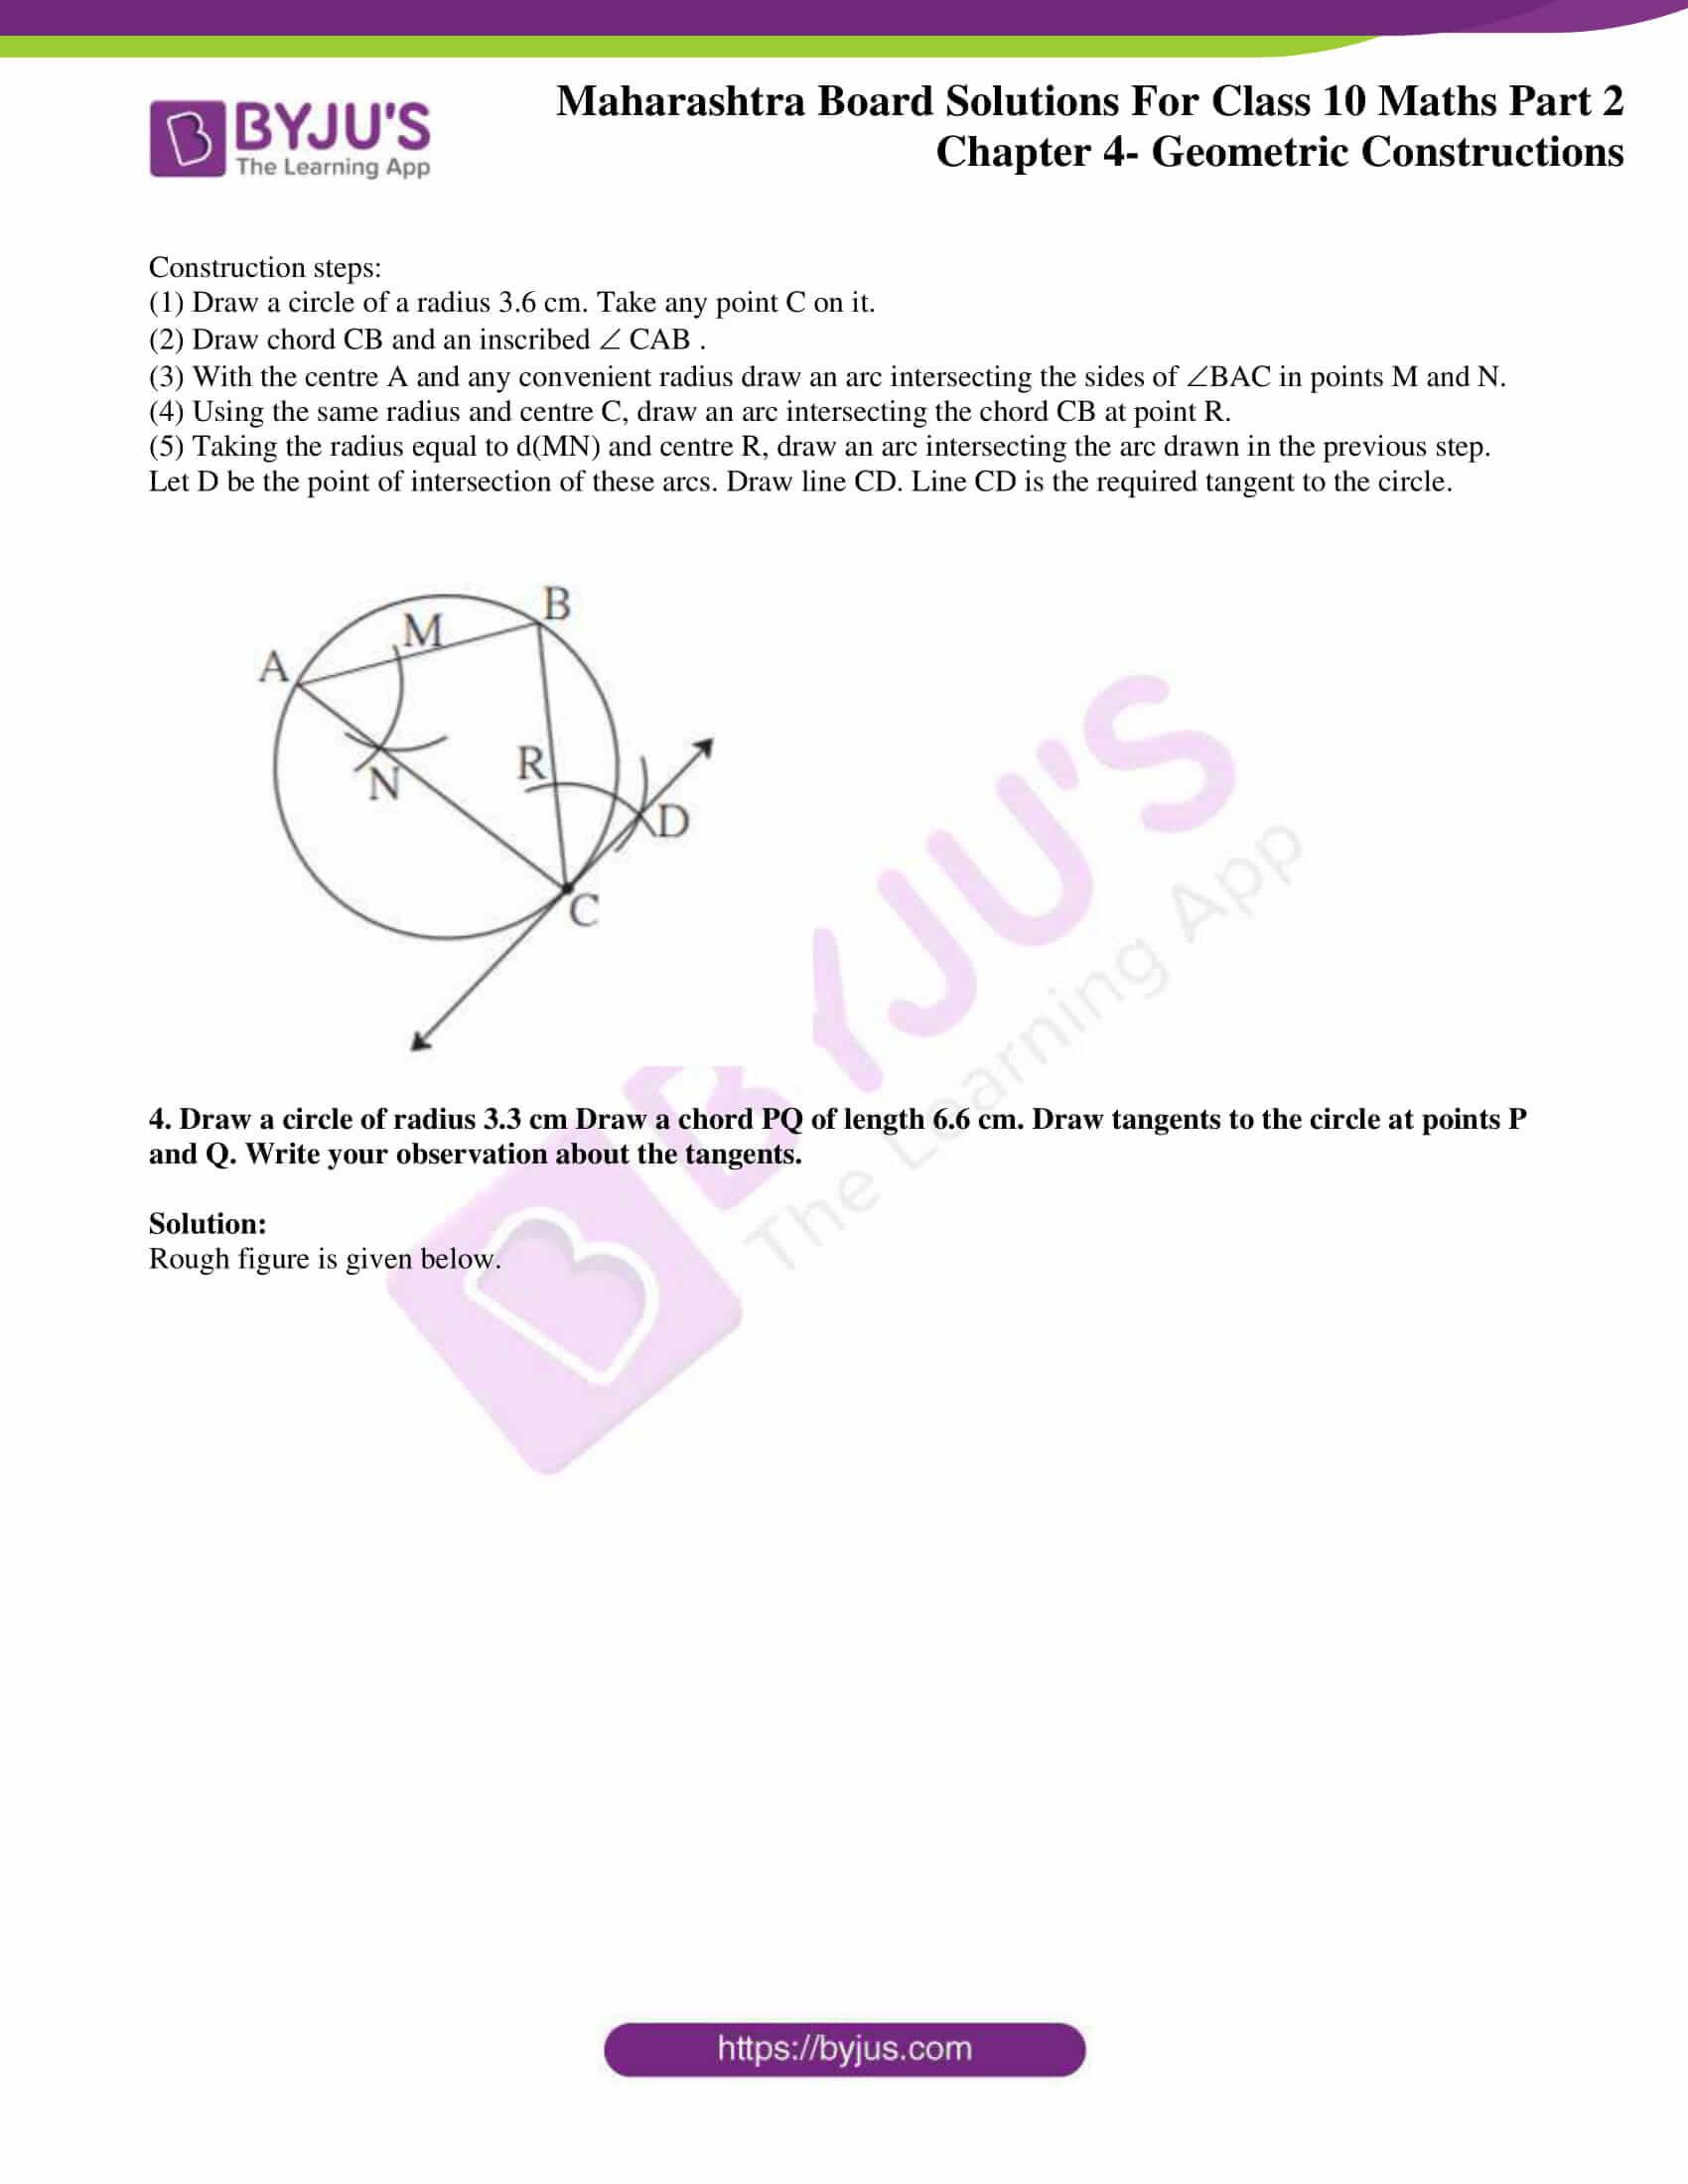 msbshse sol class 10 maths part 2 chapter 4 07